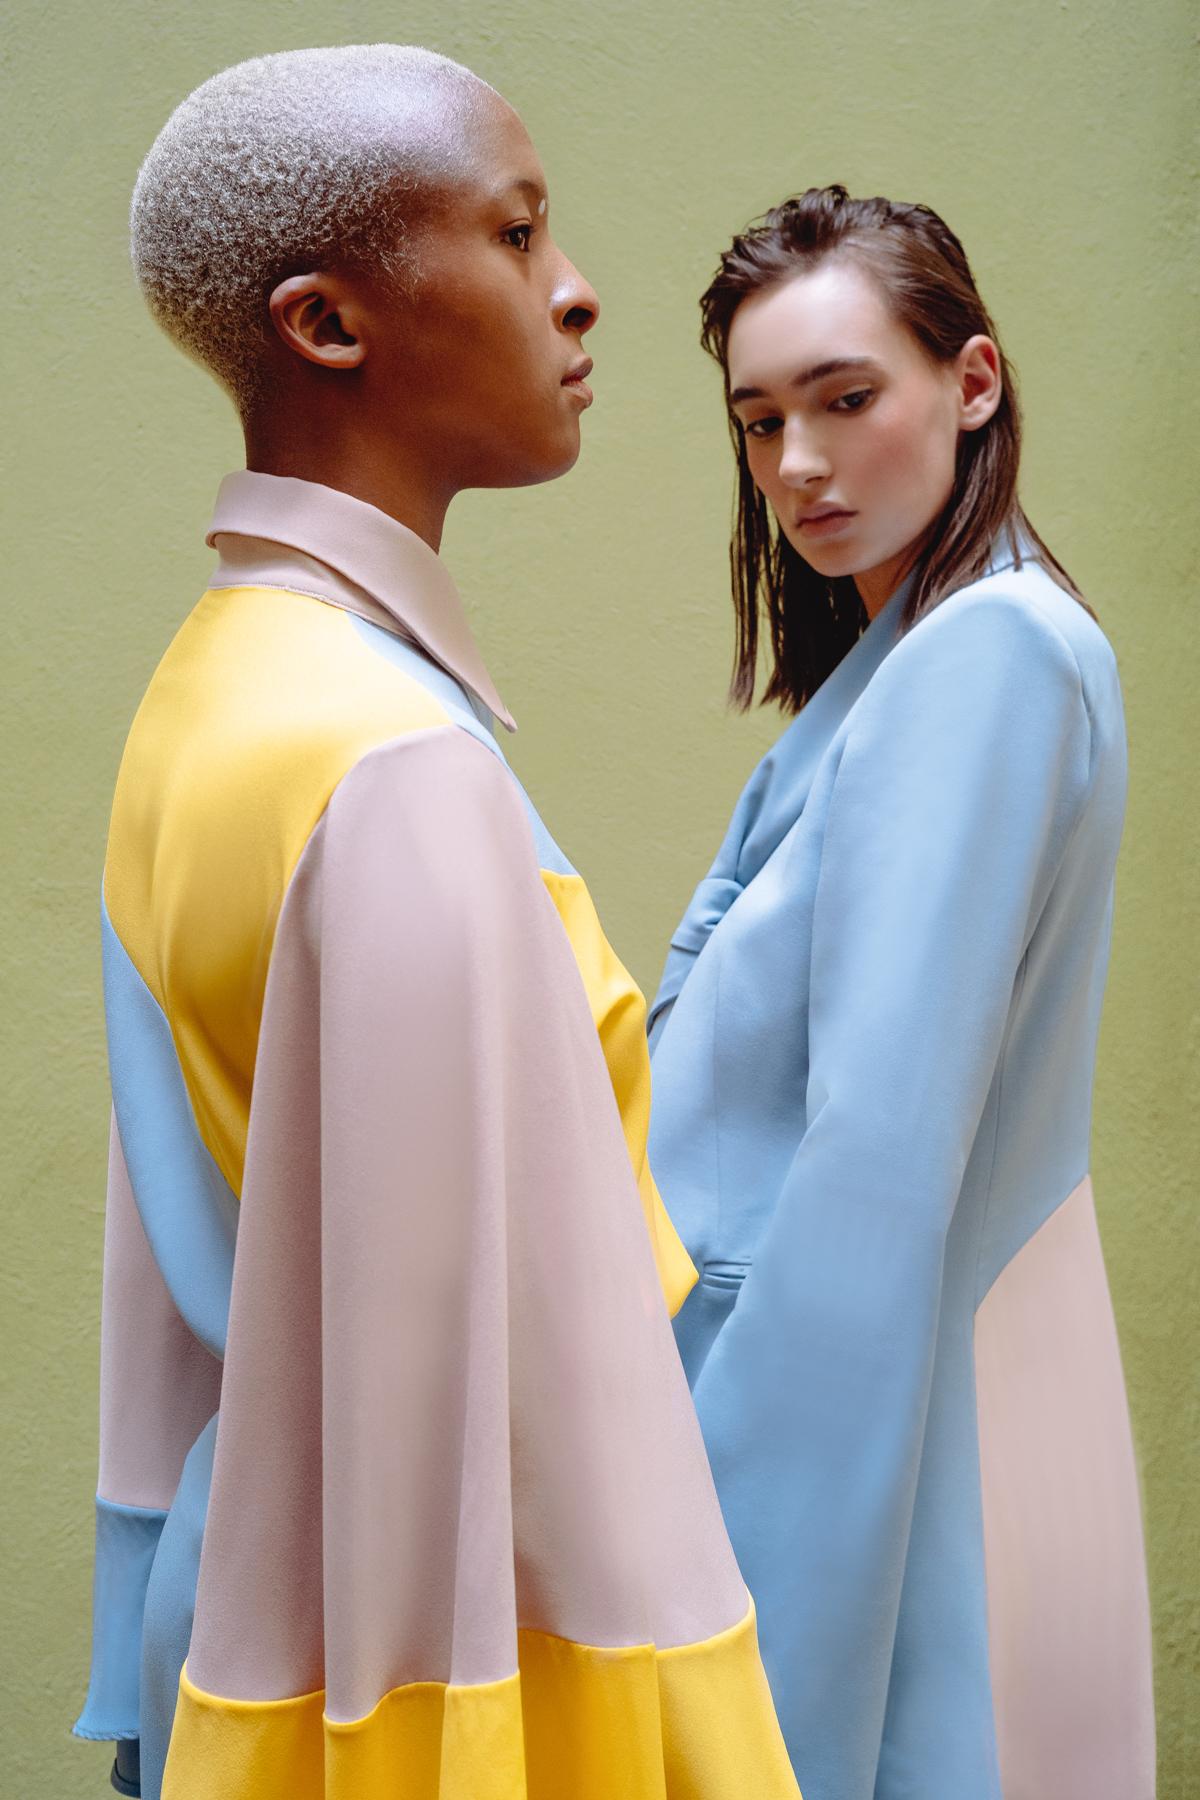 VOGUE Italia Photo series: South African Fashion, Andrea Baioni 99 Juta Street Johannesburg